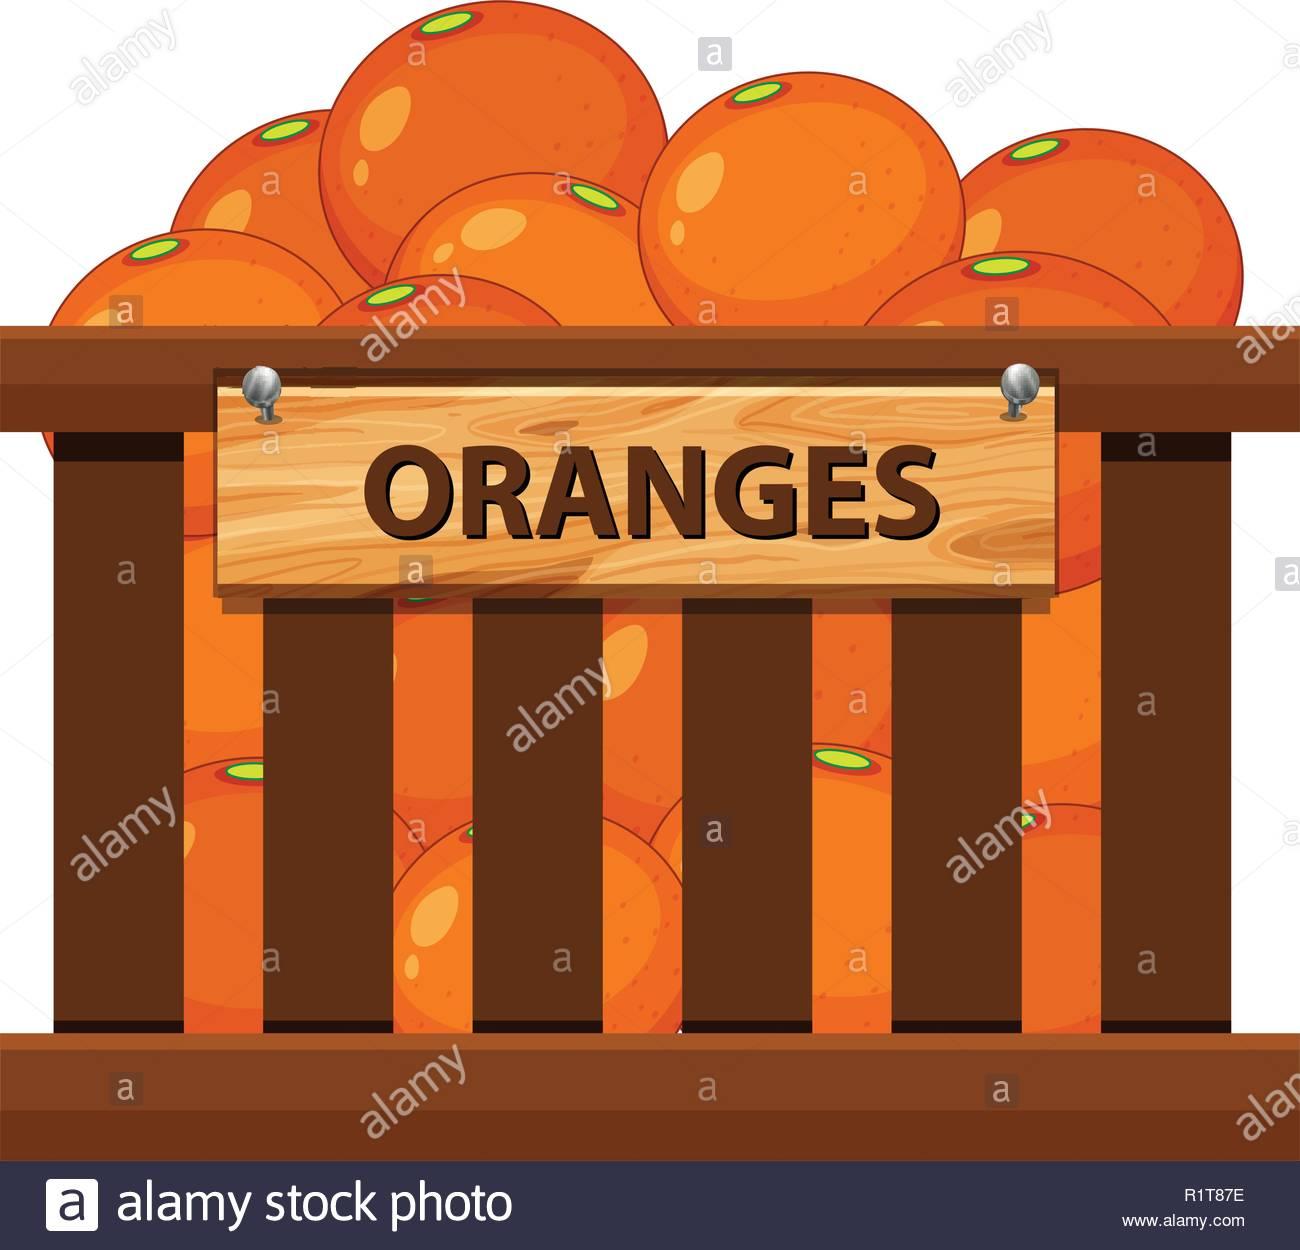 Orange in the wooden crate illustration Stock Vector Art.